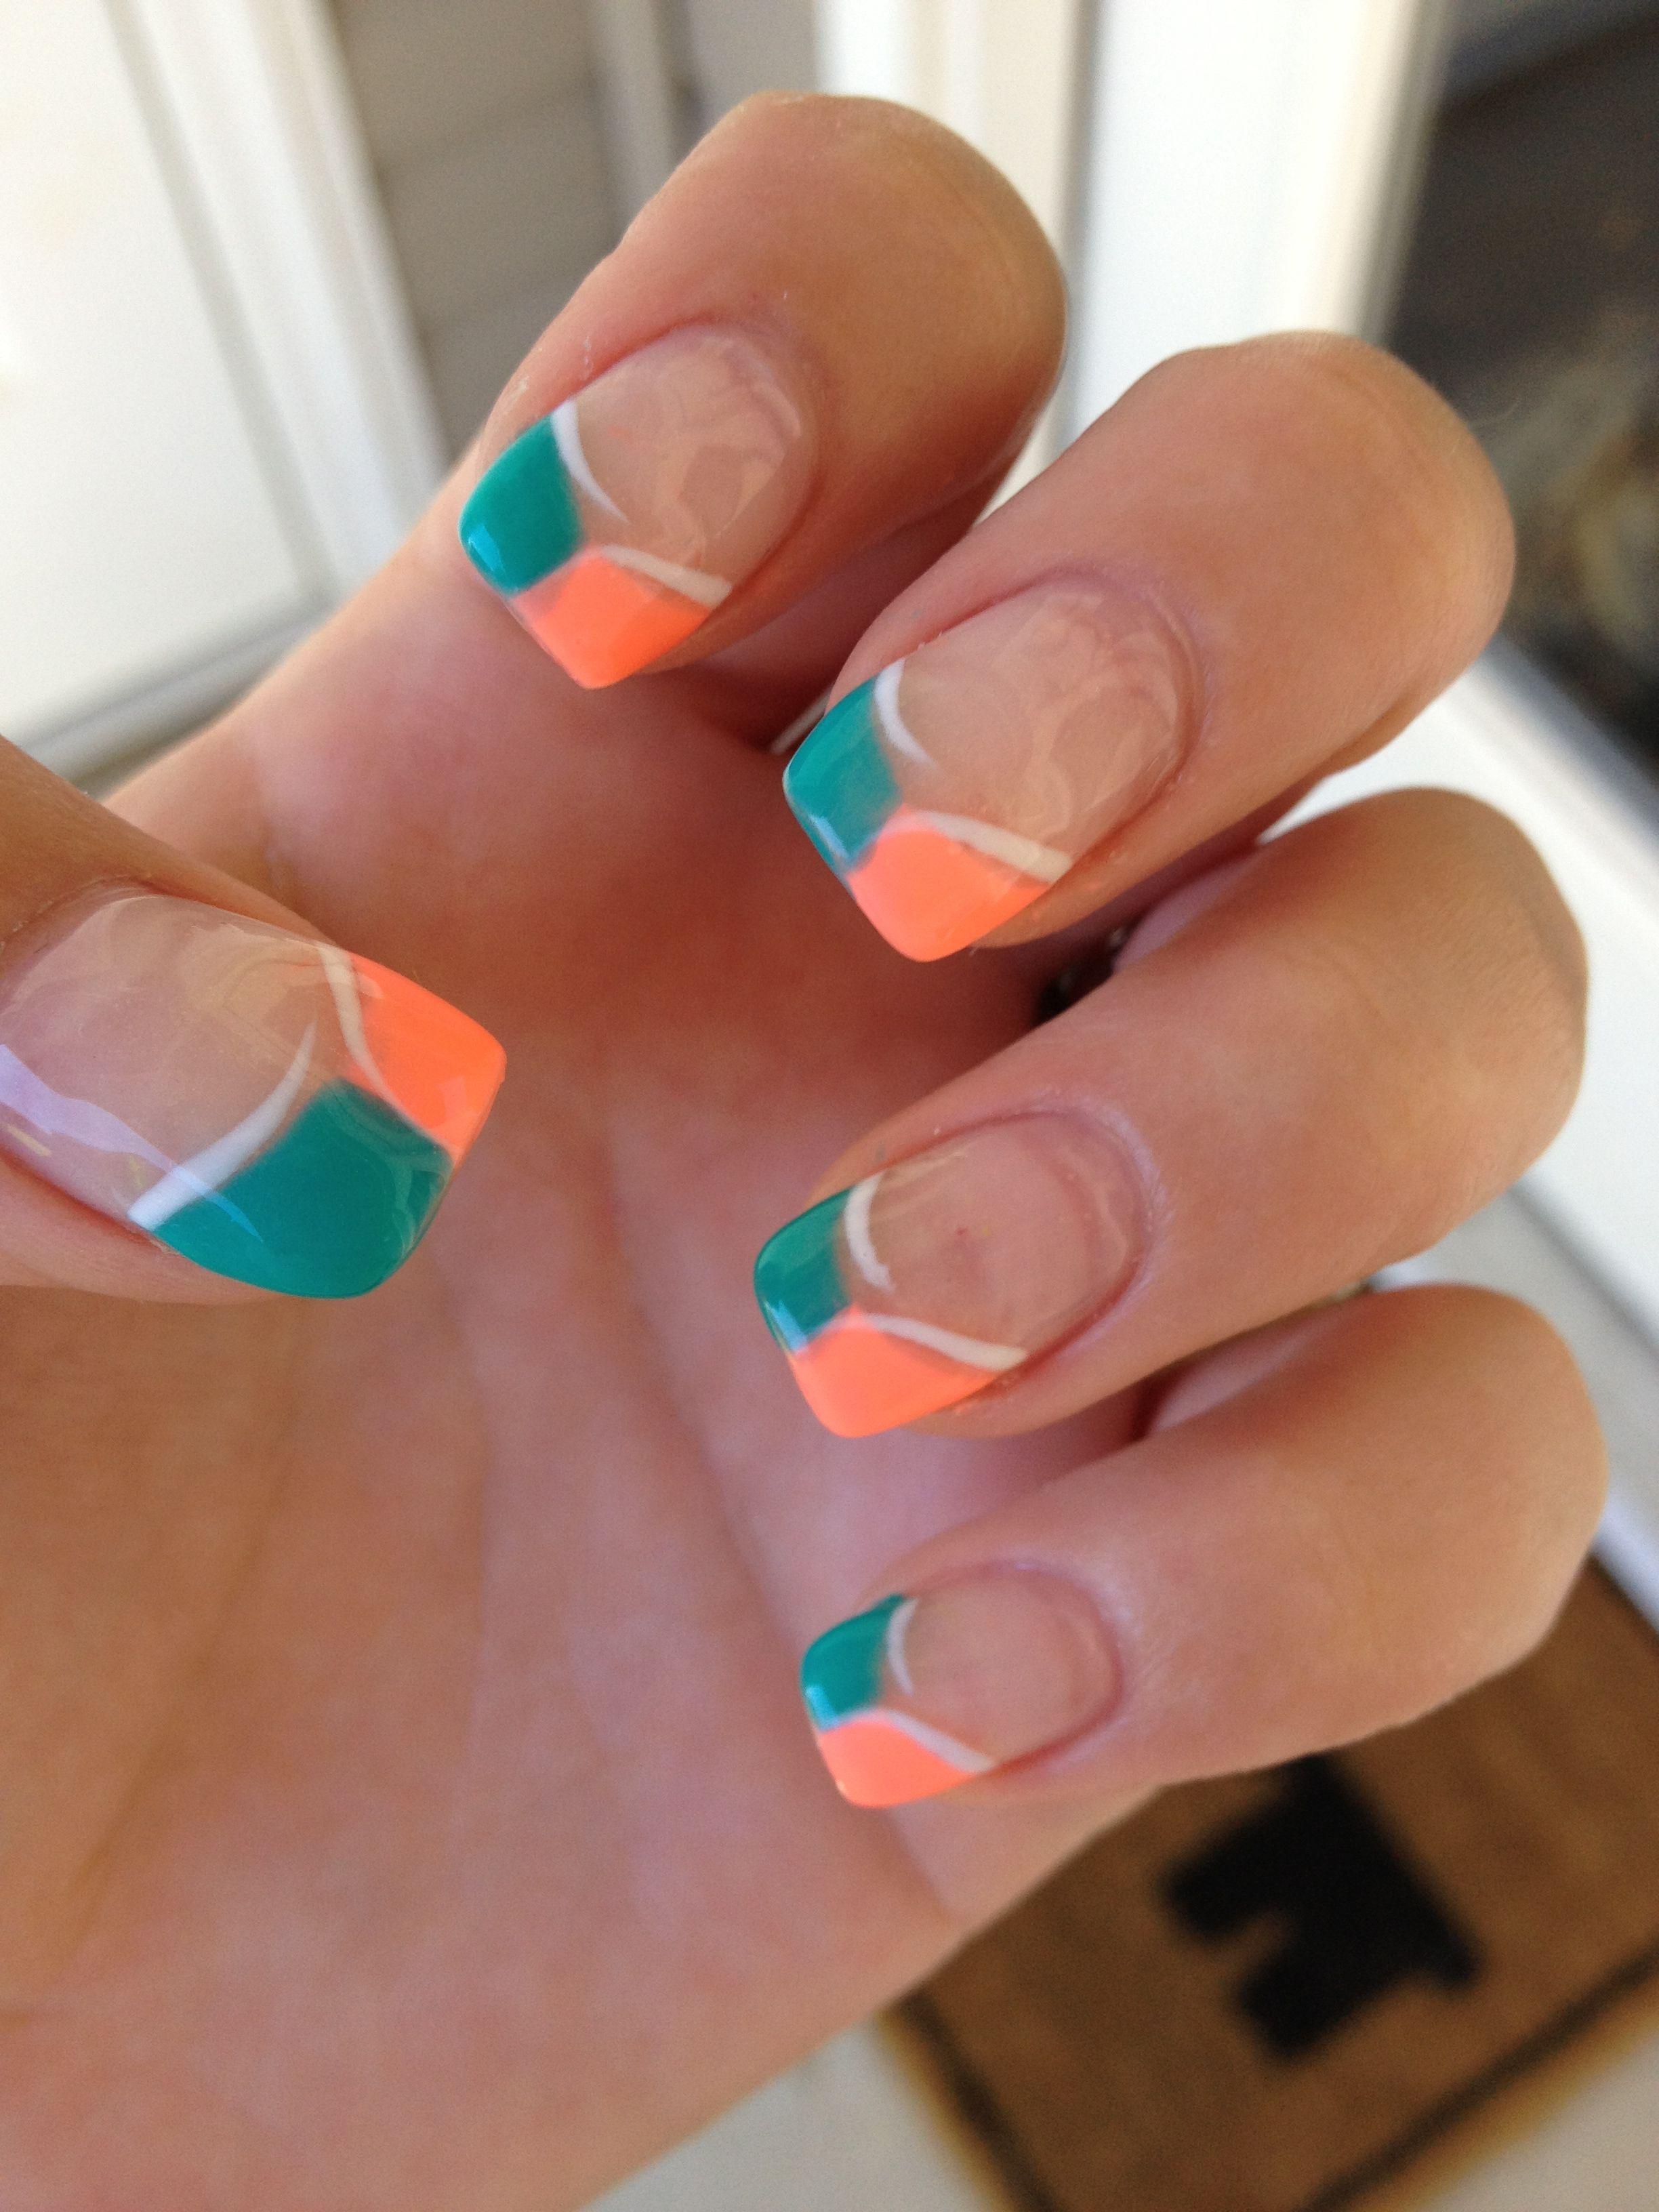 Miami dolphins gel nail art | Nail art | Pinterest | Gel nail art ...